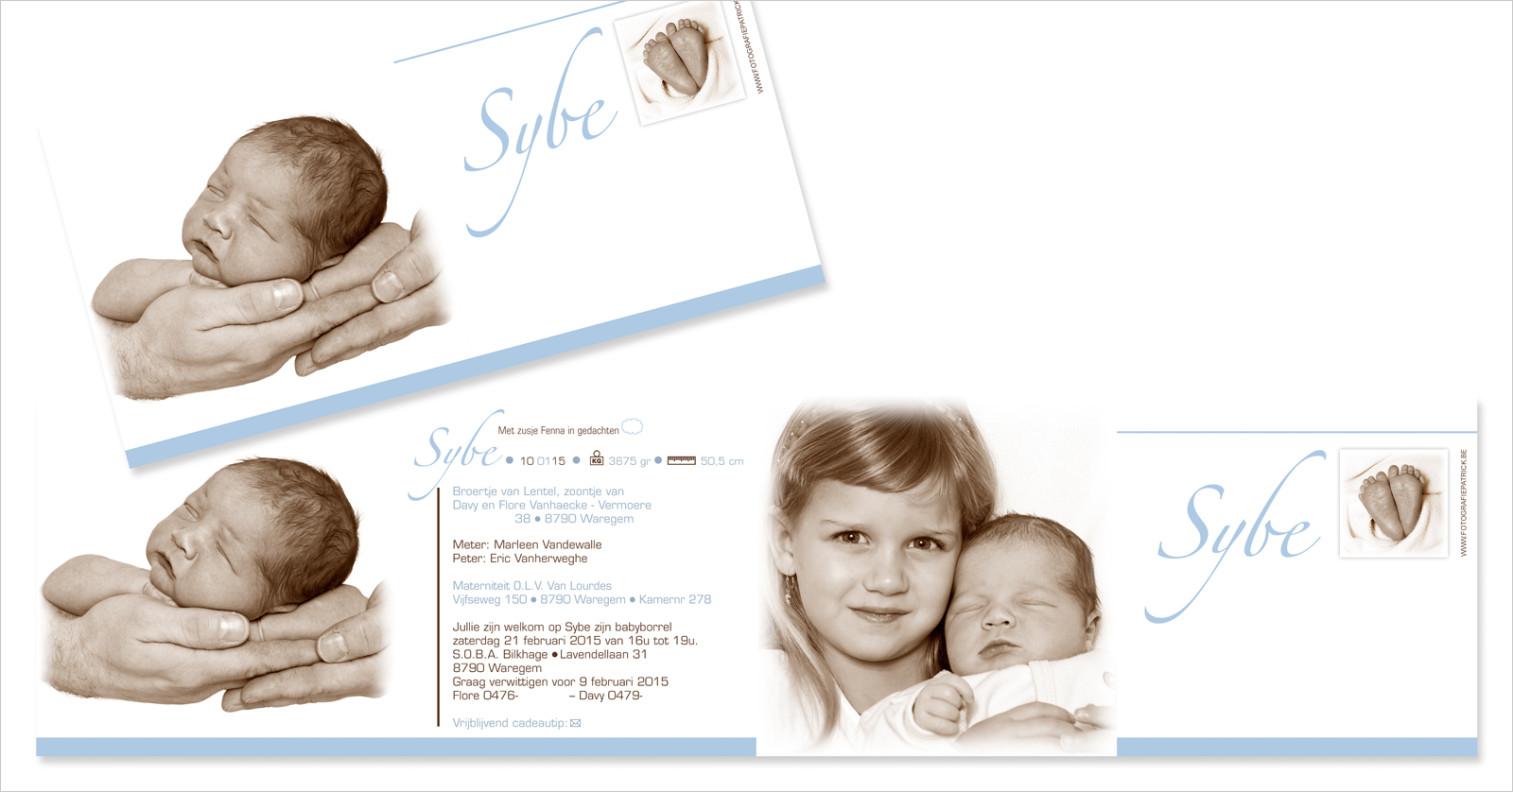 Geboortekaartje met foto van Sybe